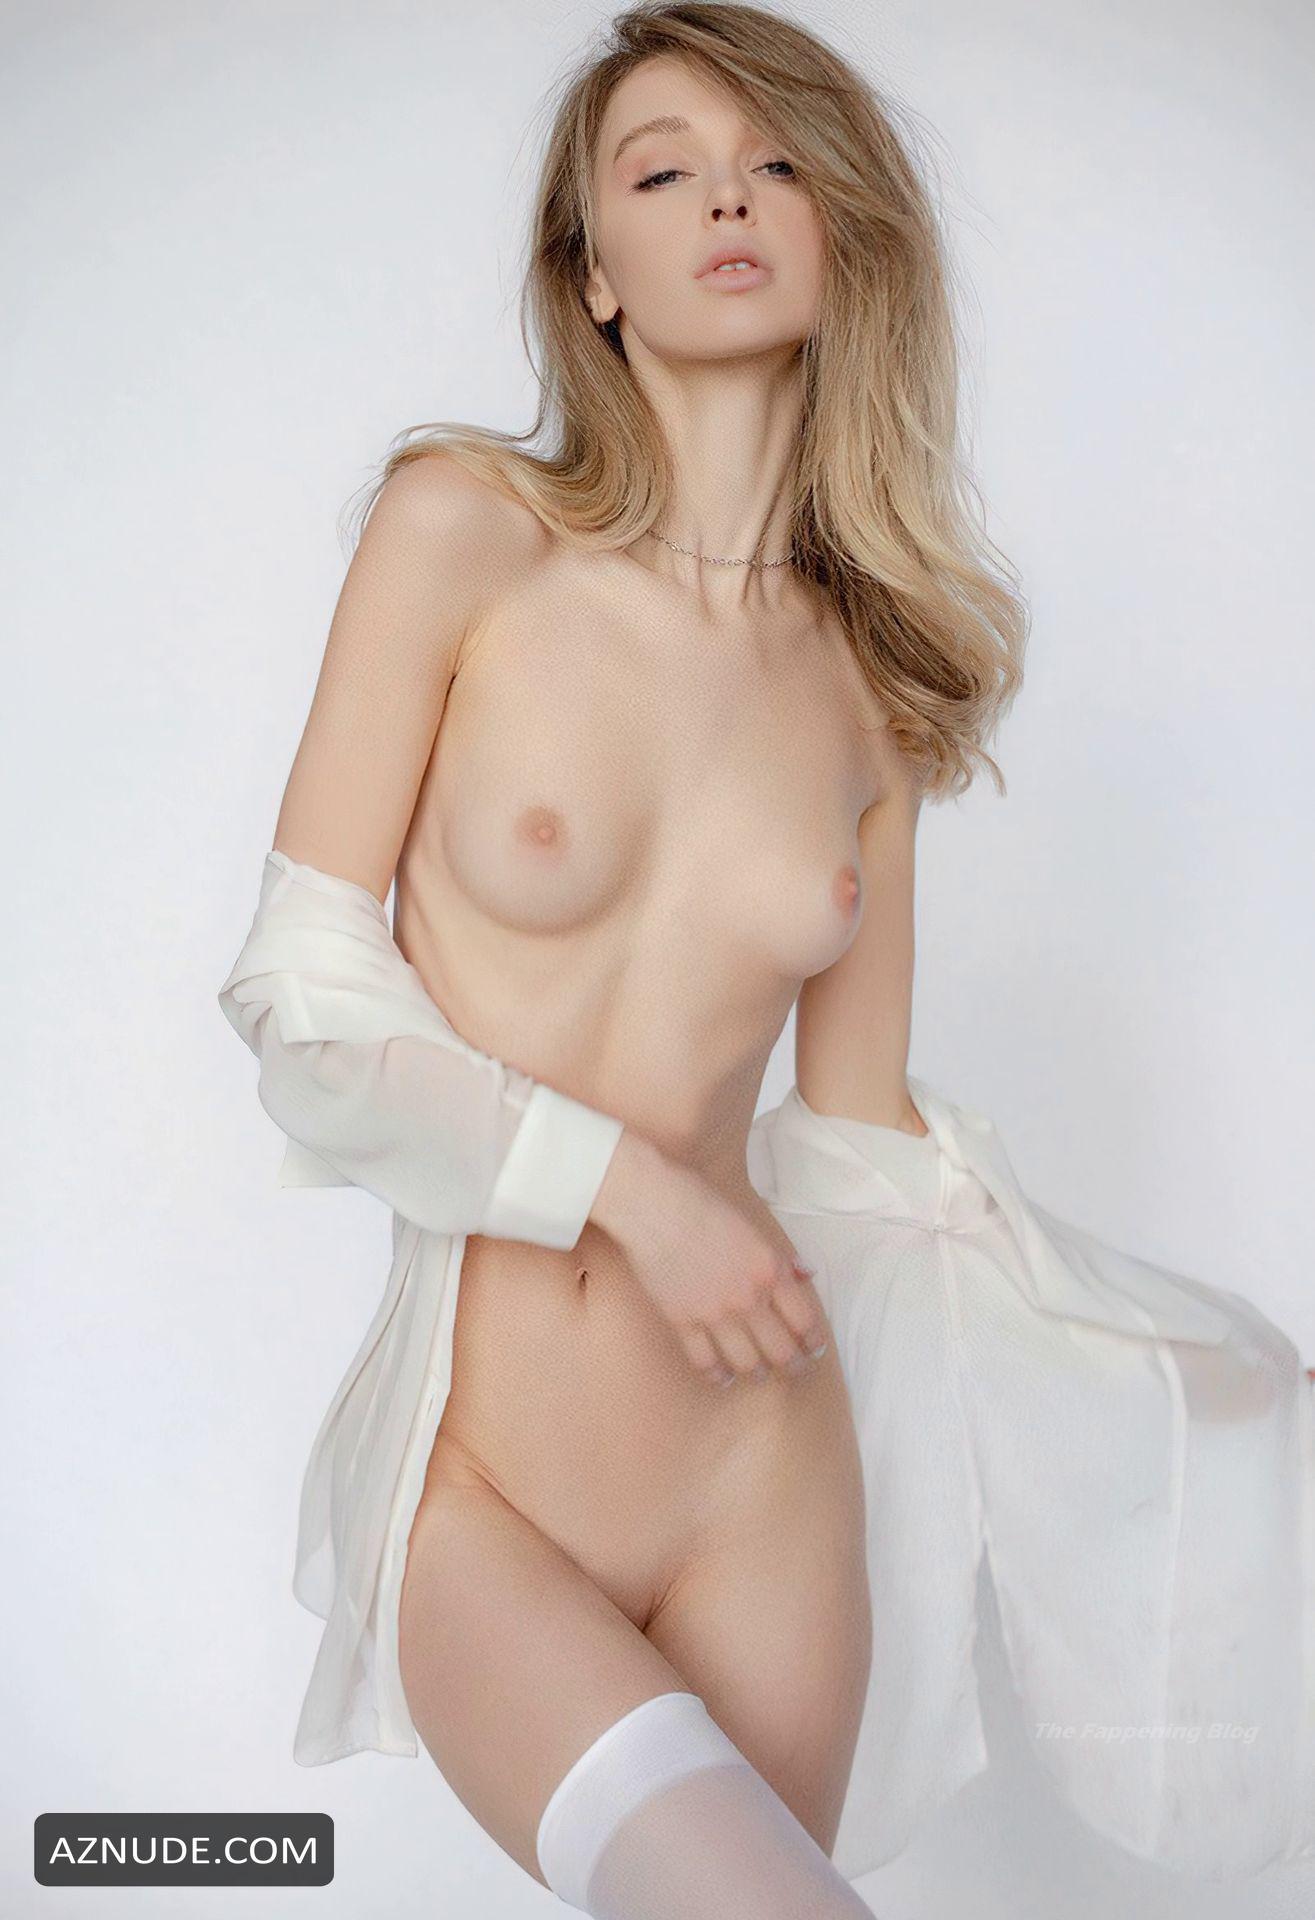 Nude anna tsaralunga Anna Tsaralunga